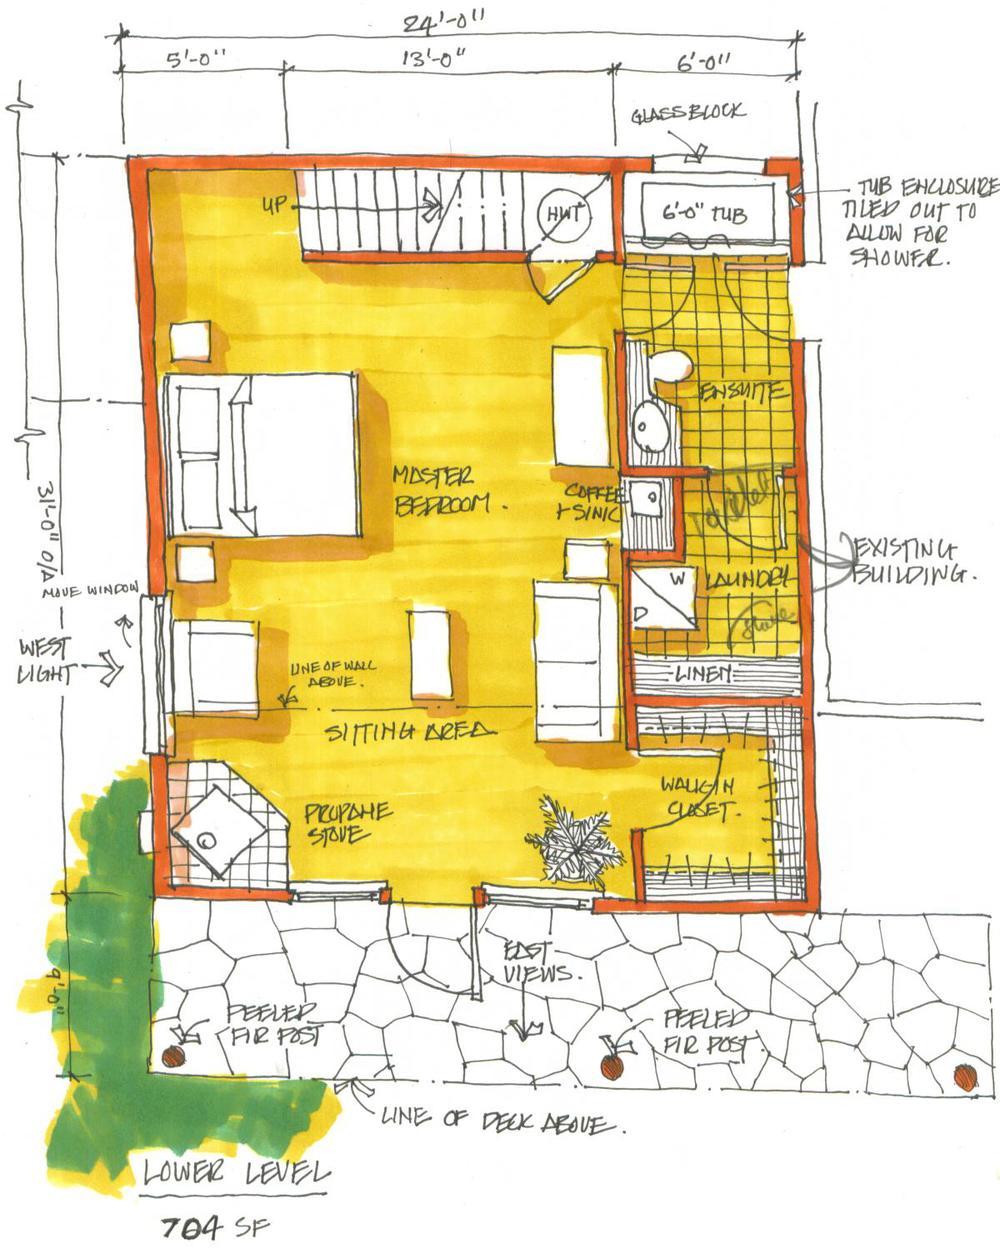 lavander farm plan 1.jpg